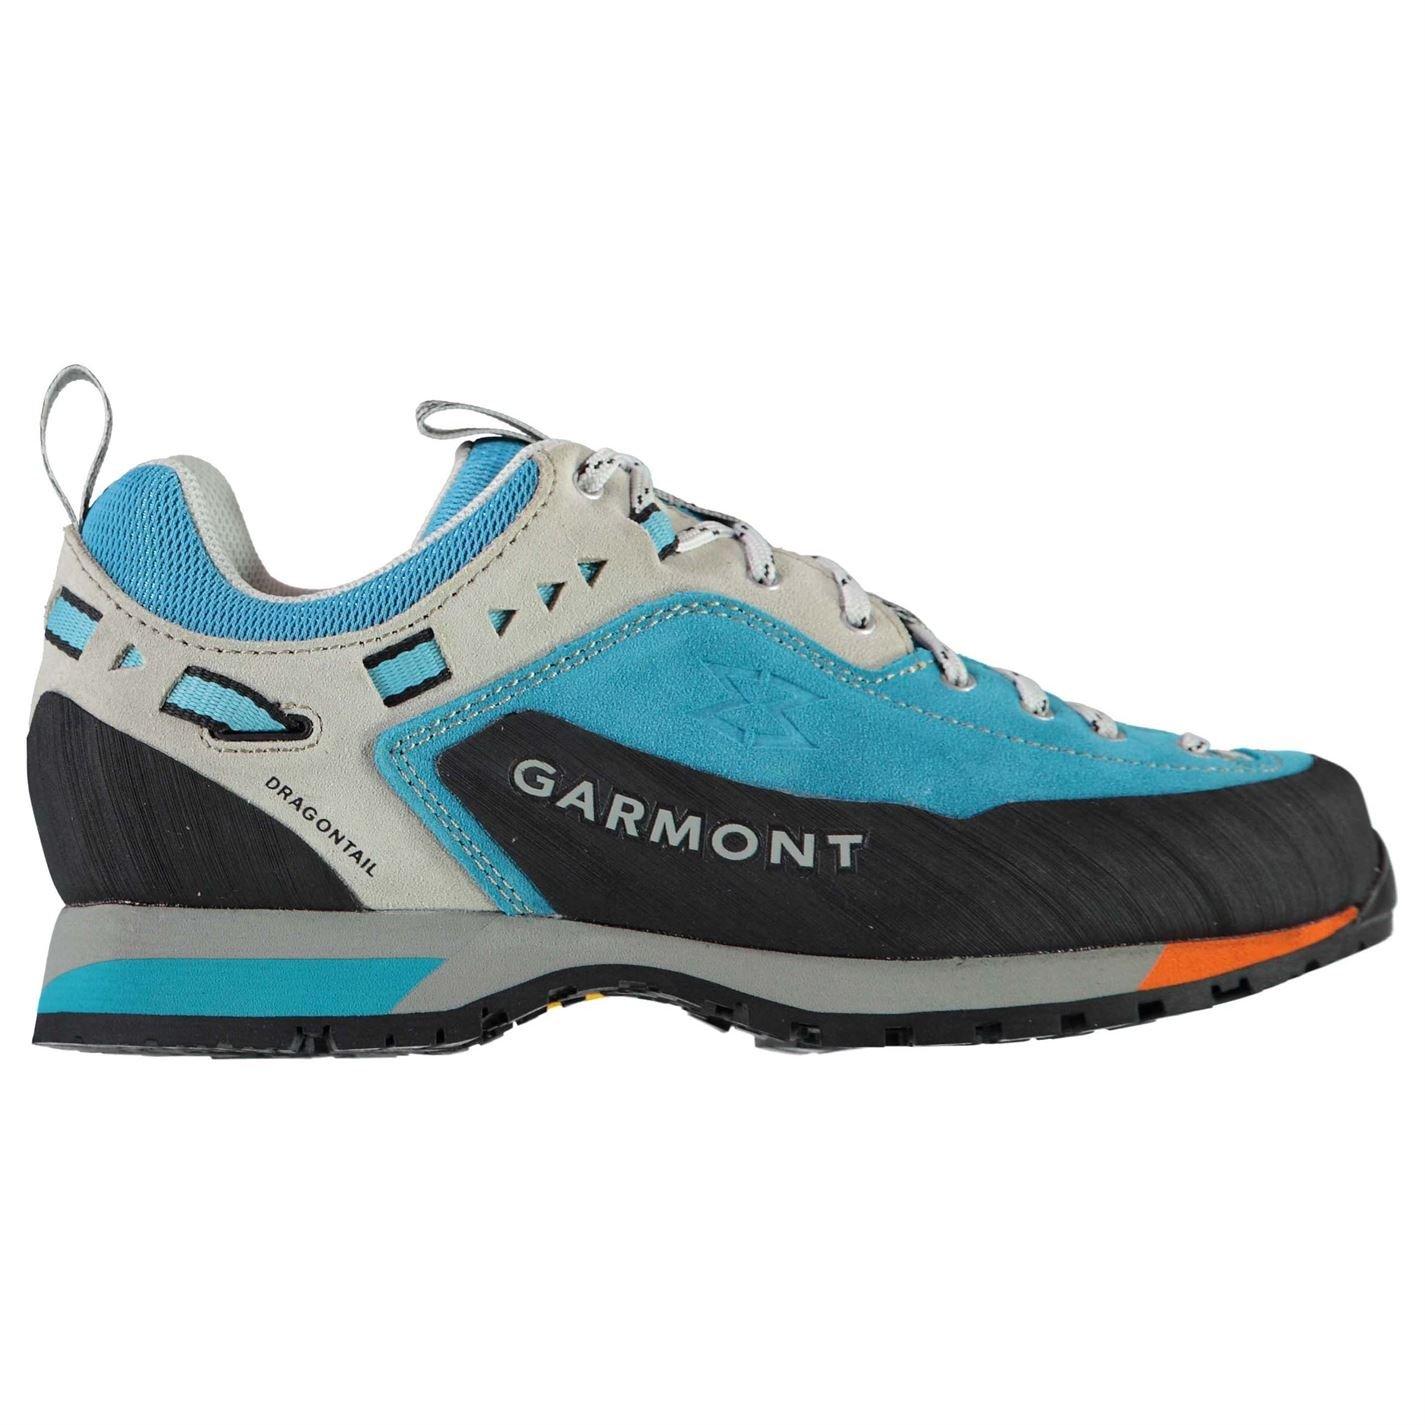 Amazon.com   Garmont Womens Dragontail Shoes Outdoor Walking Trekking   Walking